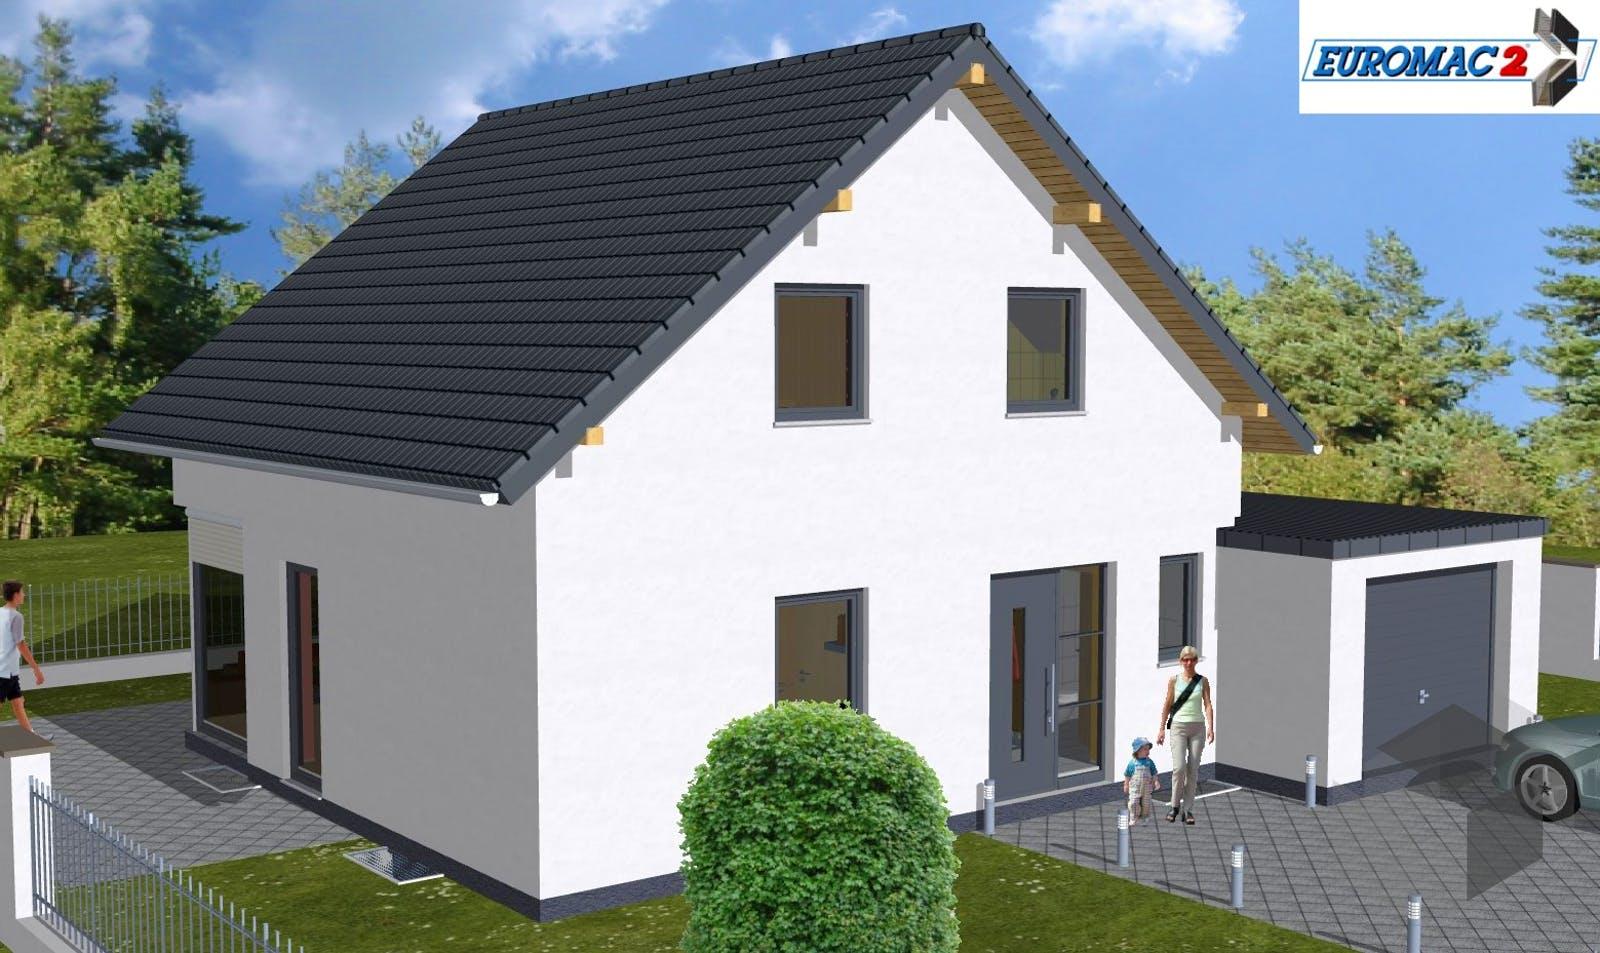 ferienhaus bauen fertighaus holzhaus bauen preise holzhaus bauen preise ideas de decoraci n. Black Bedroom Furniture Sets. Home Design Ideas